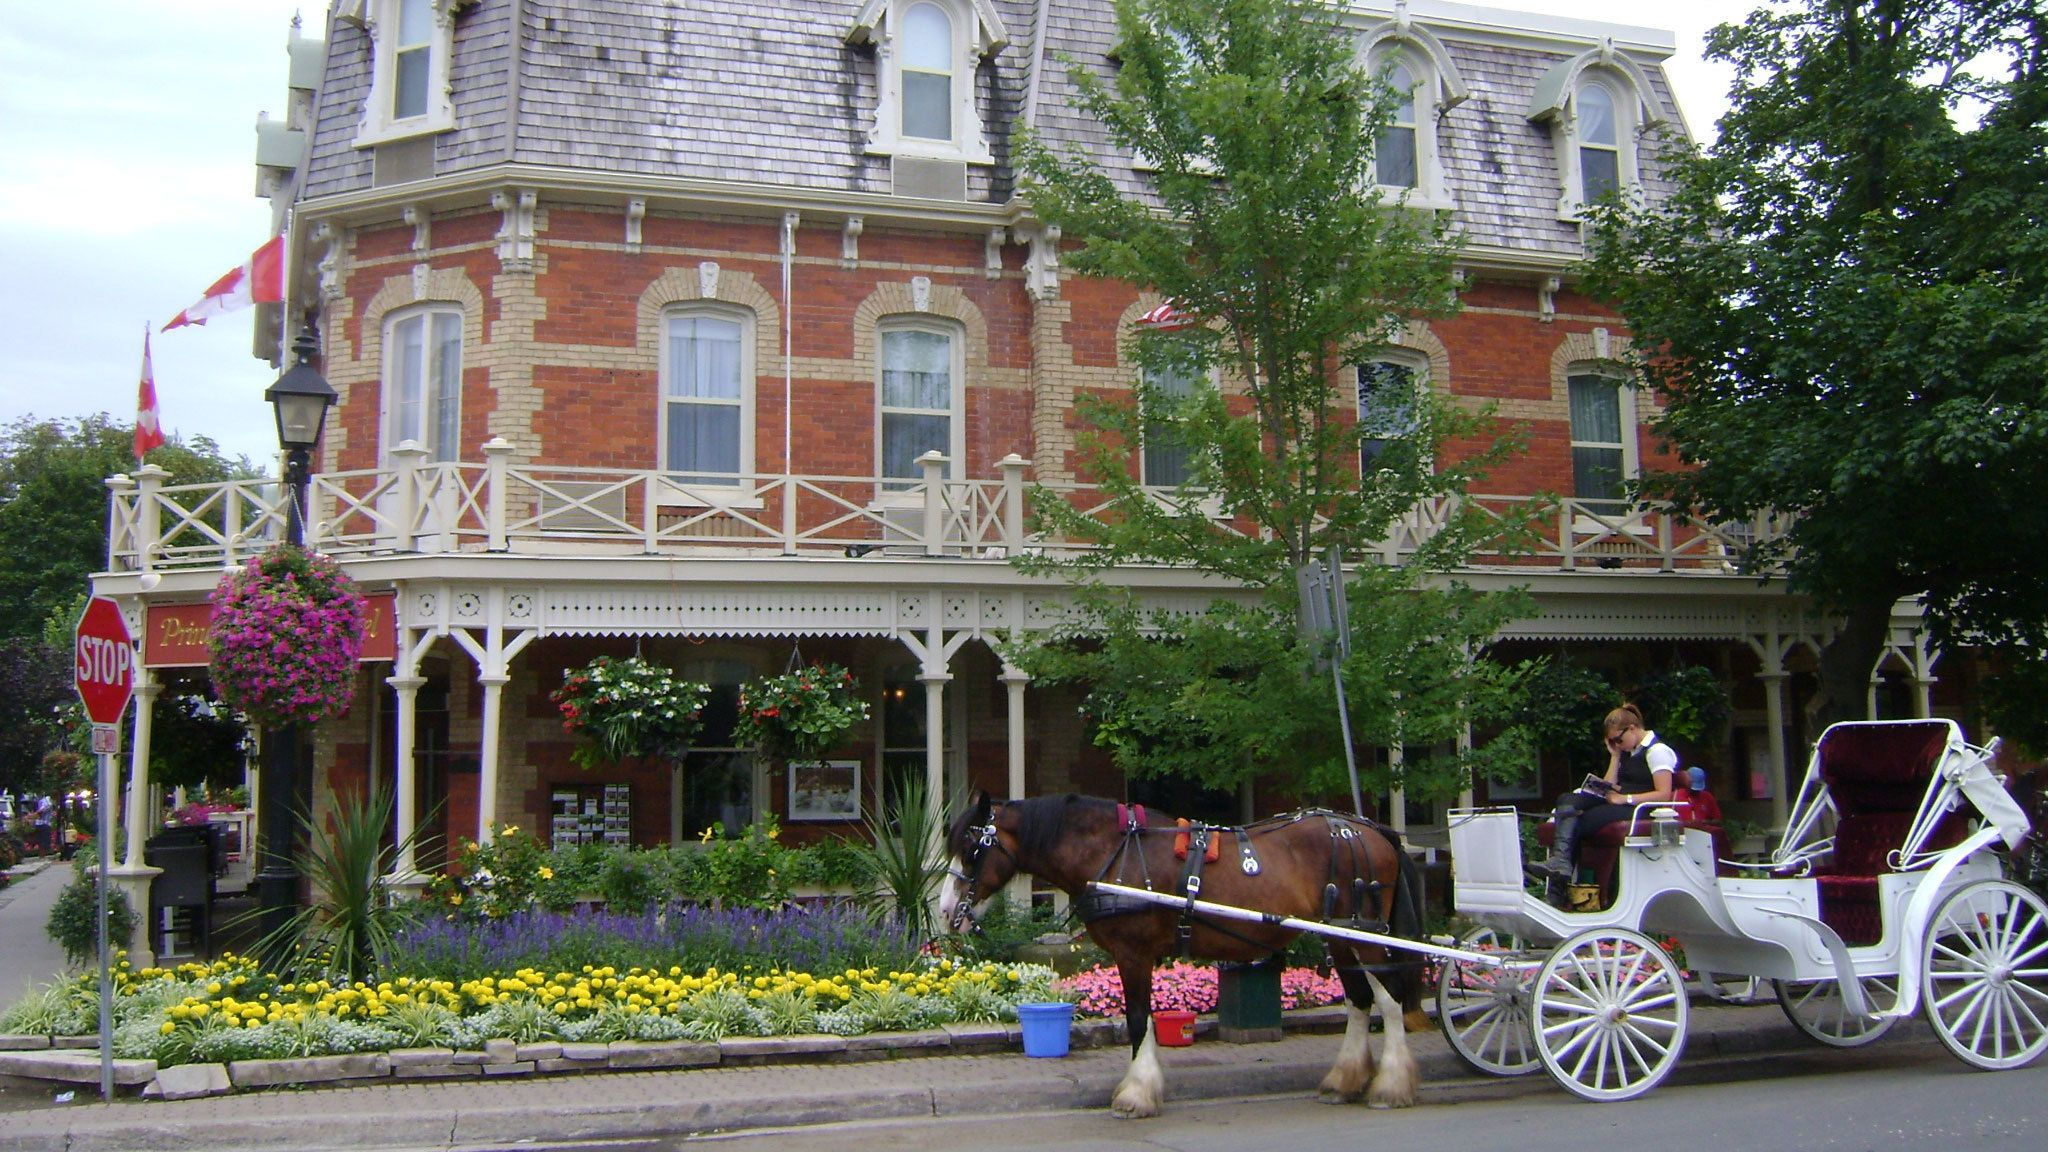 Horse drawn carriage outside of building at Niagara Falls